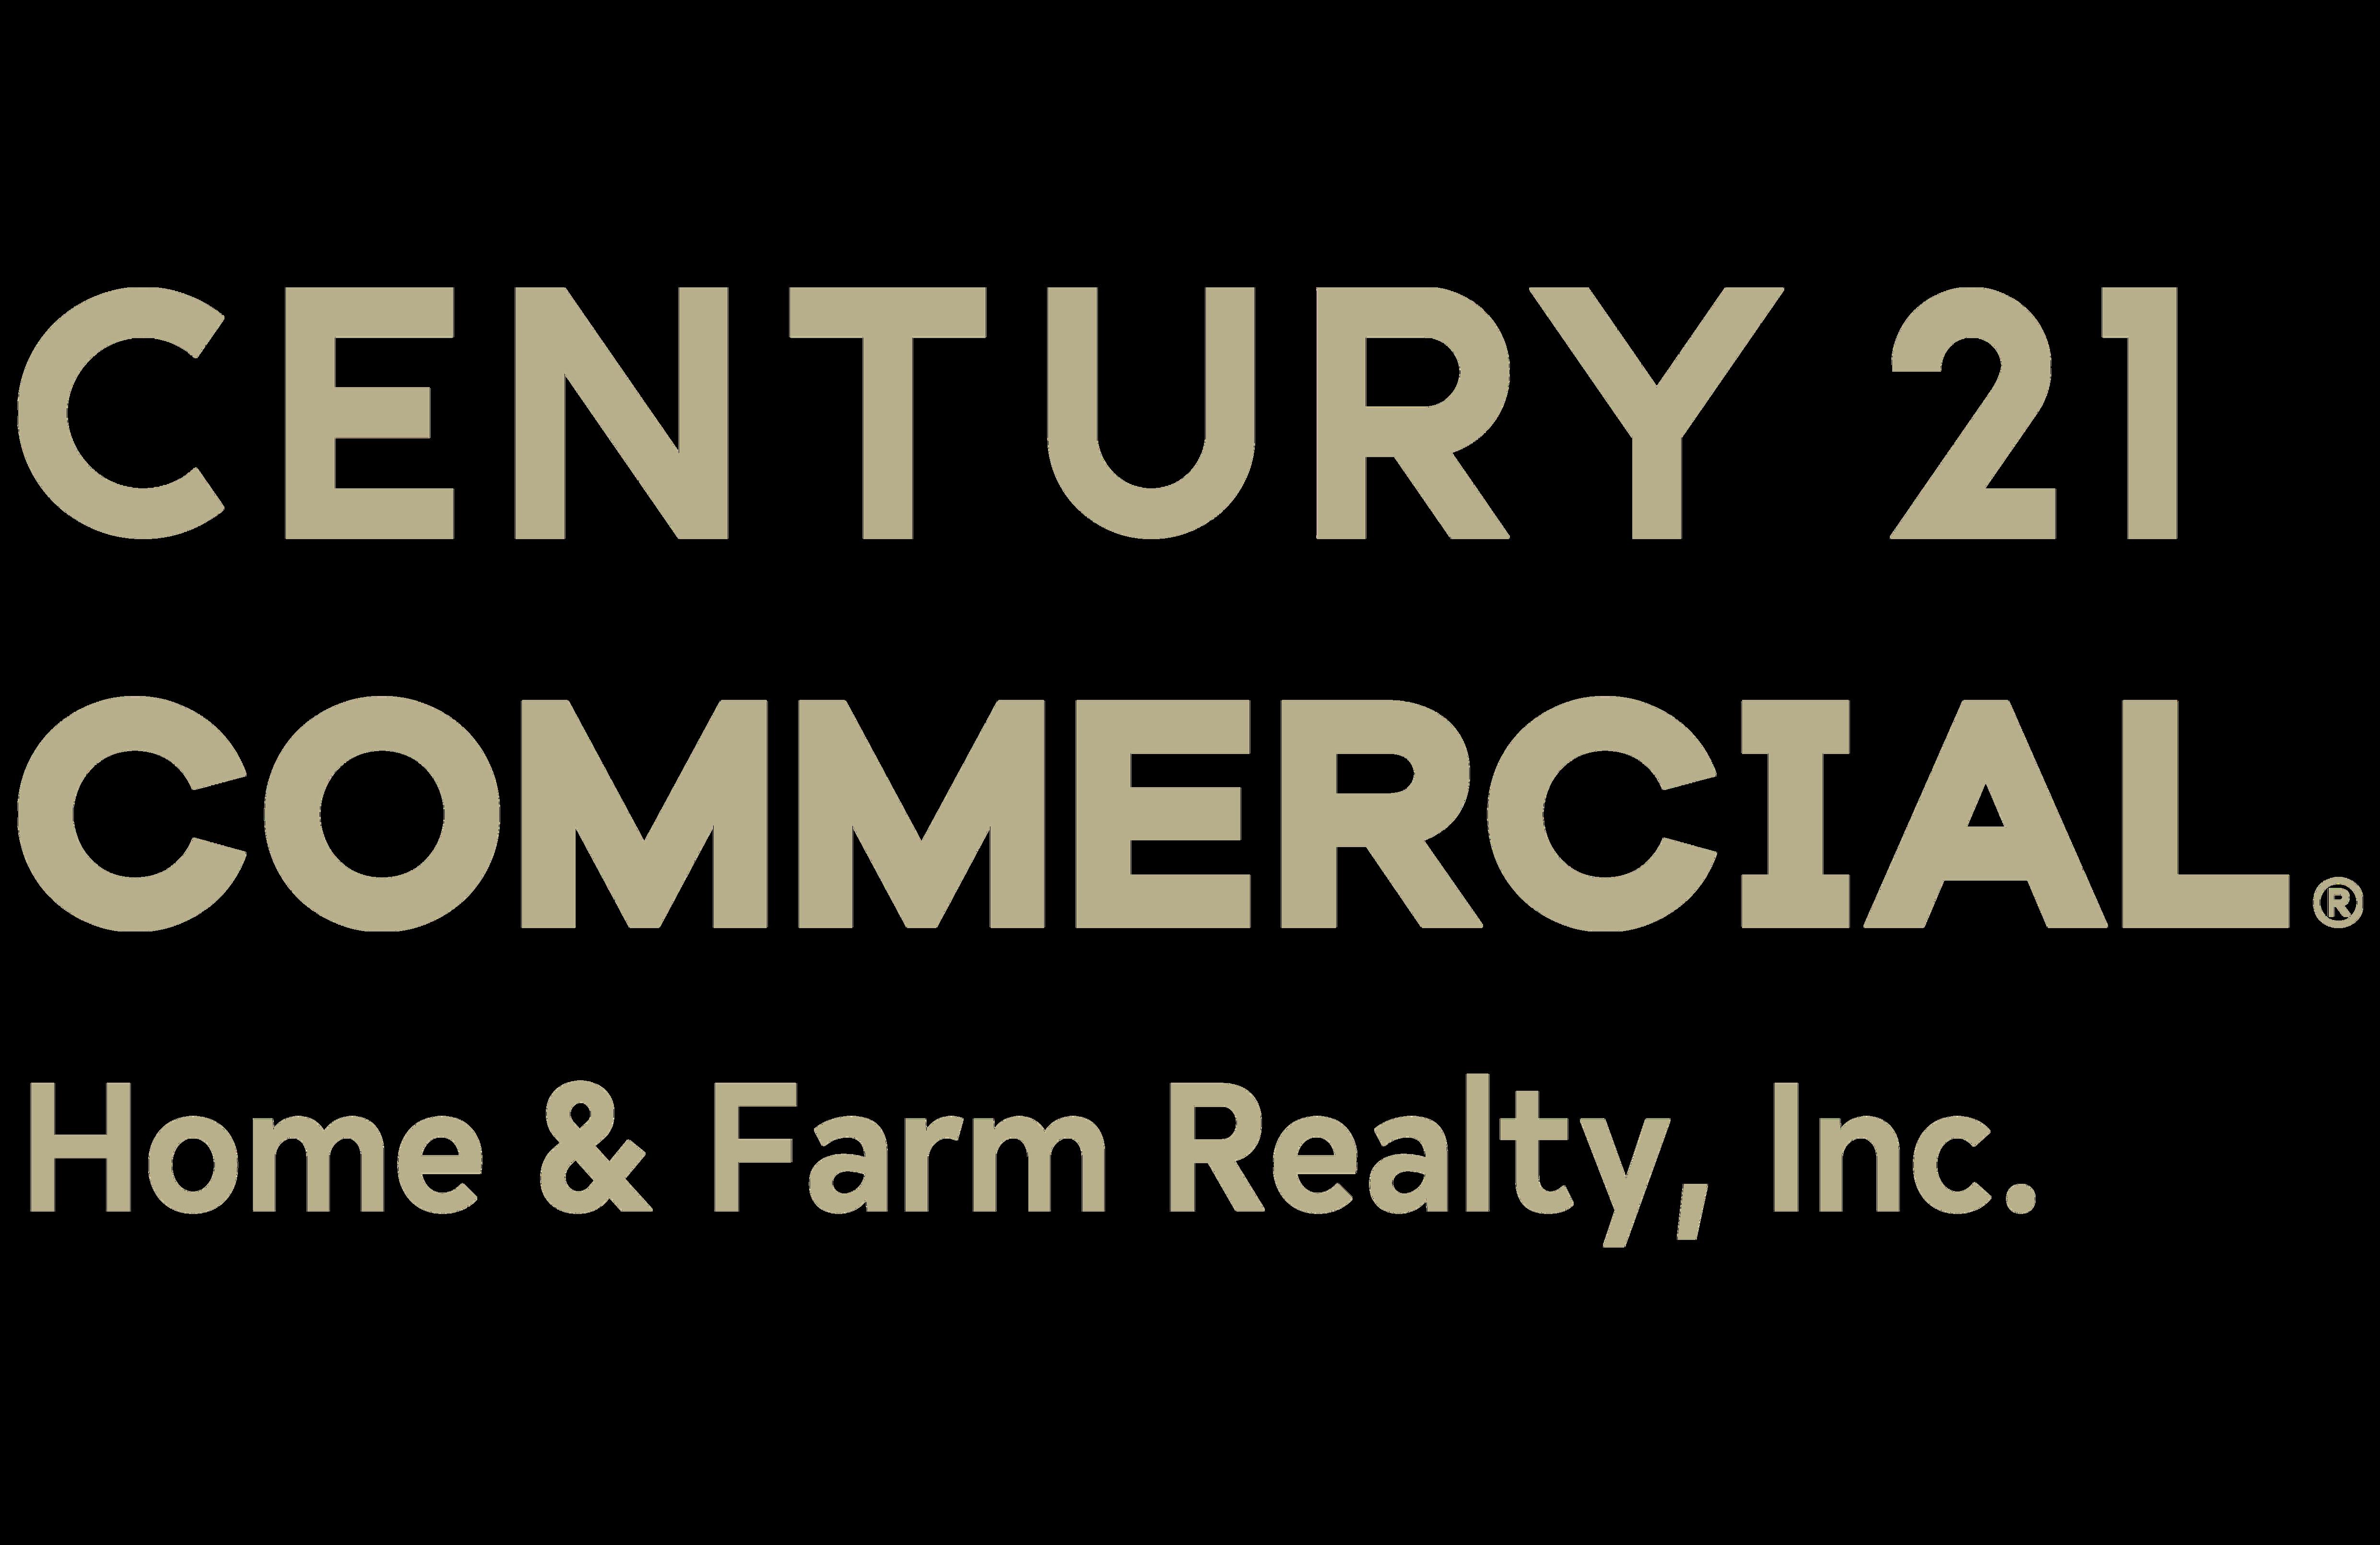 Clay Weddle of CENTURY 21 Home & Farm Realty, Inc. logo